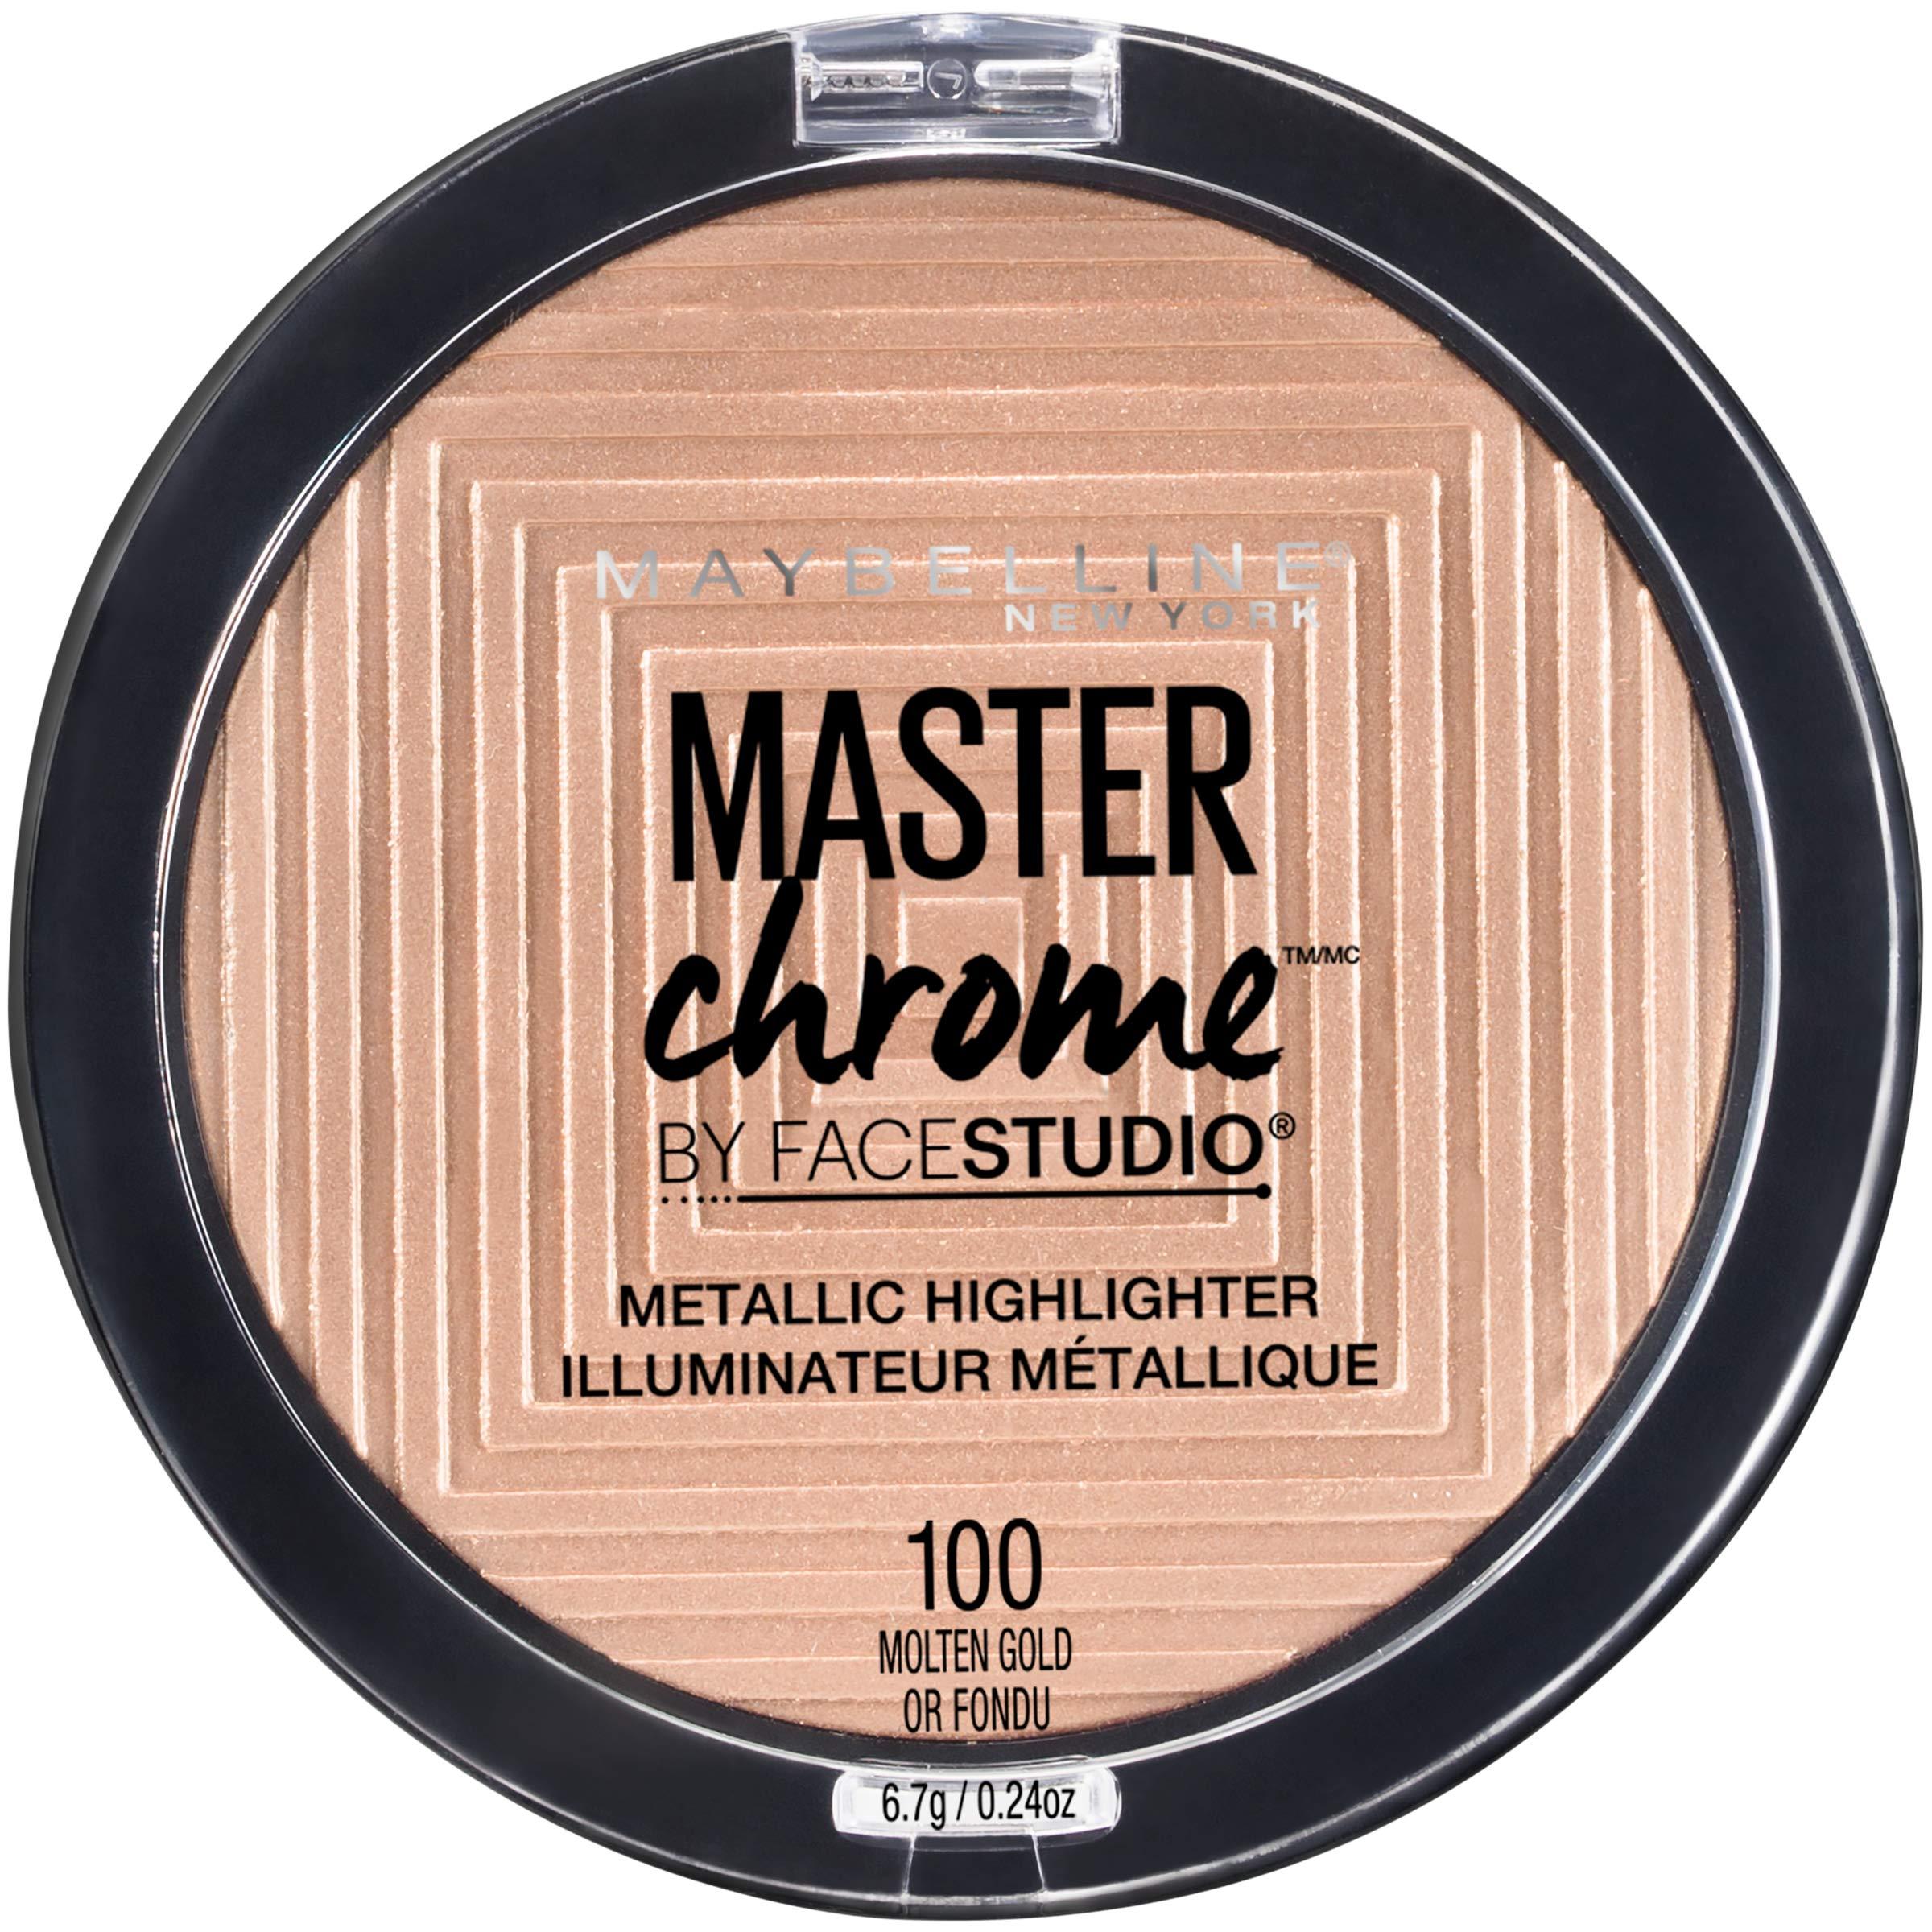 Maybelline New York Facestudio Master Chrome Metallic Highlighter Makeup, Molten Gold, 0.24 oz.